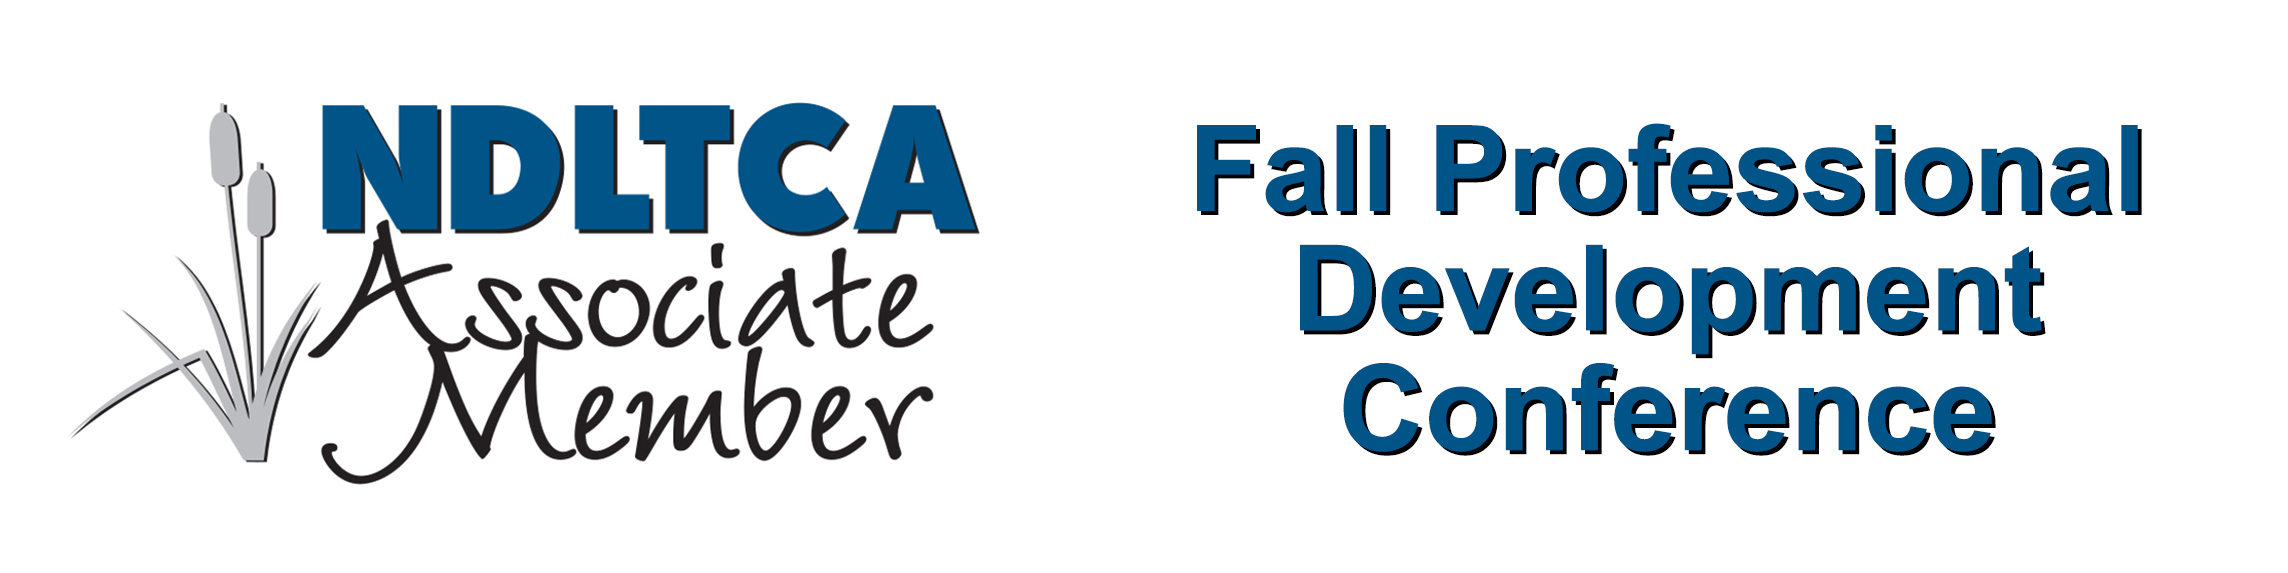 NDLTCA Fall Professional Development Conference